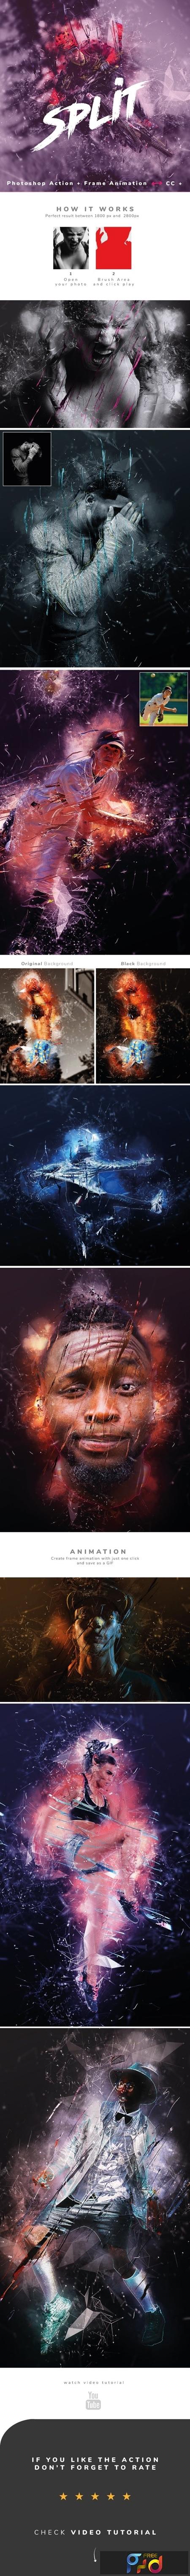 Split Photoshop Action + Animation 23607441 1